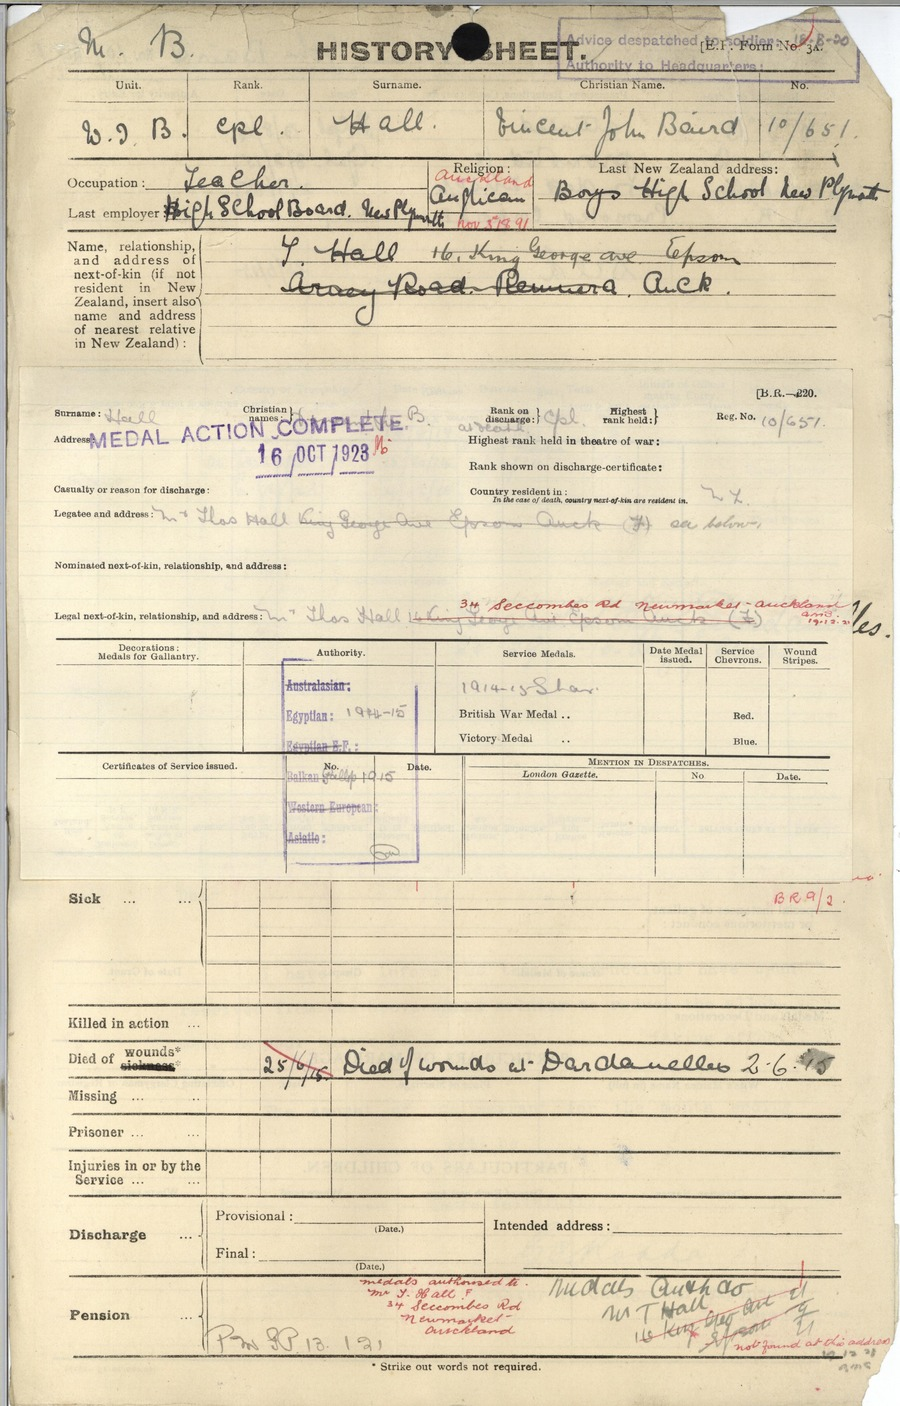 Hall VJB History Sheet